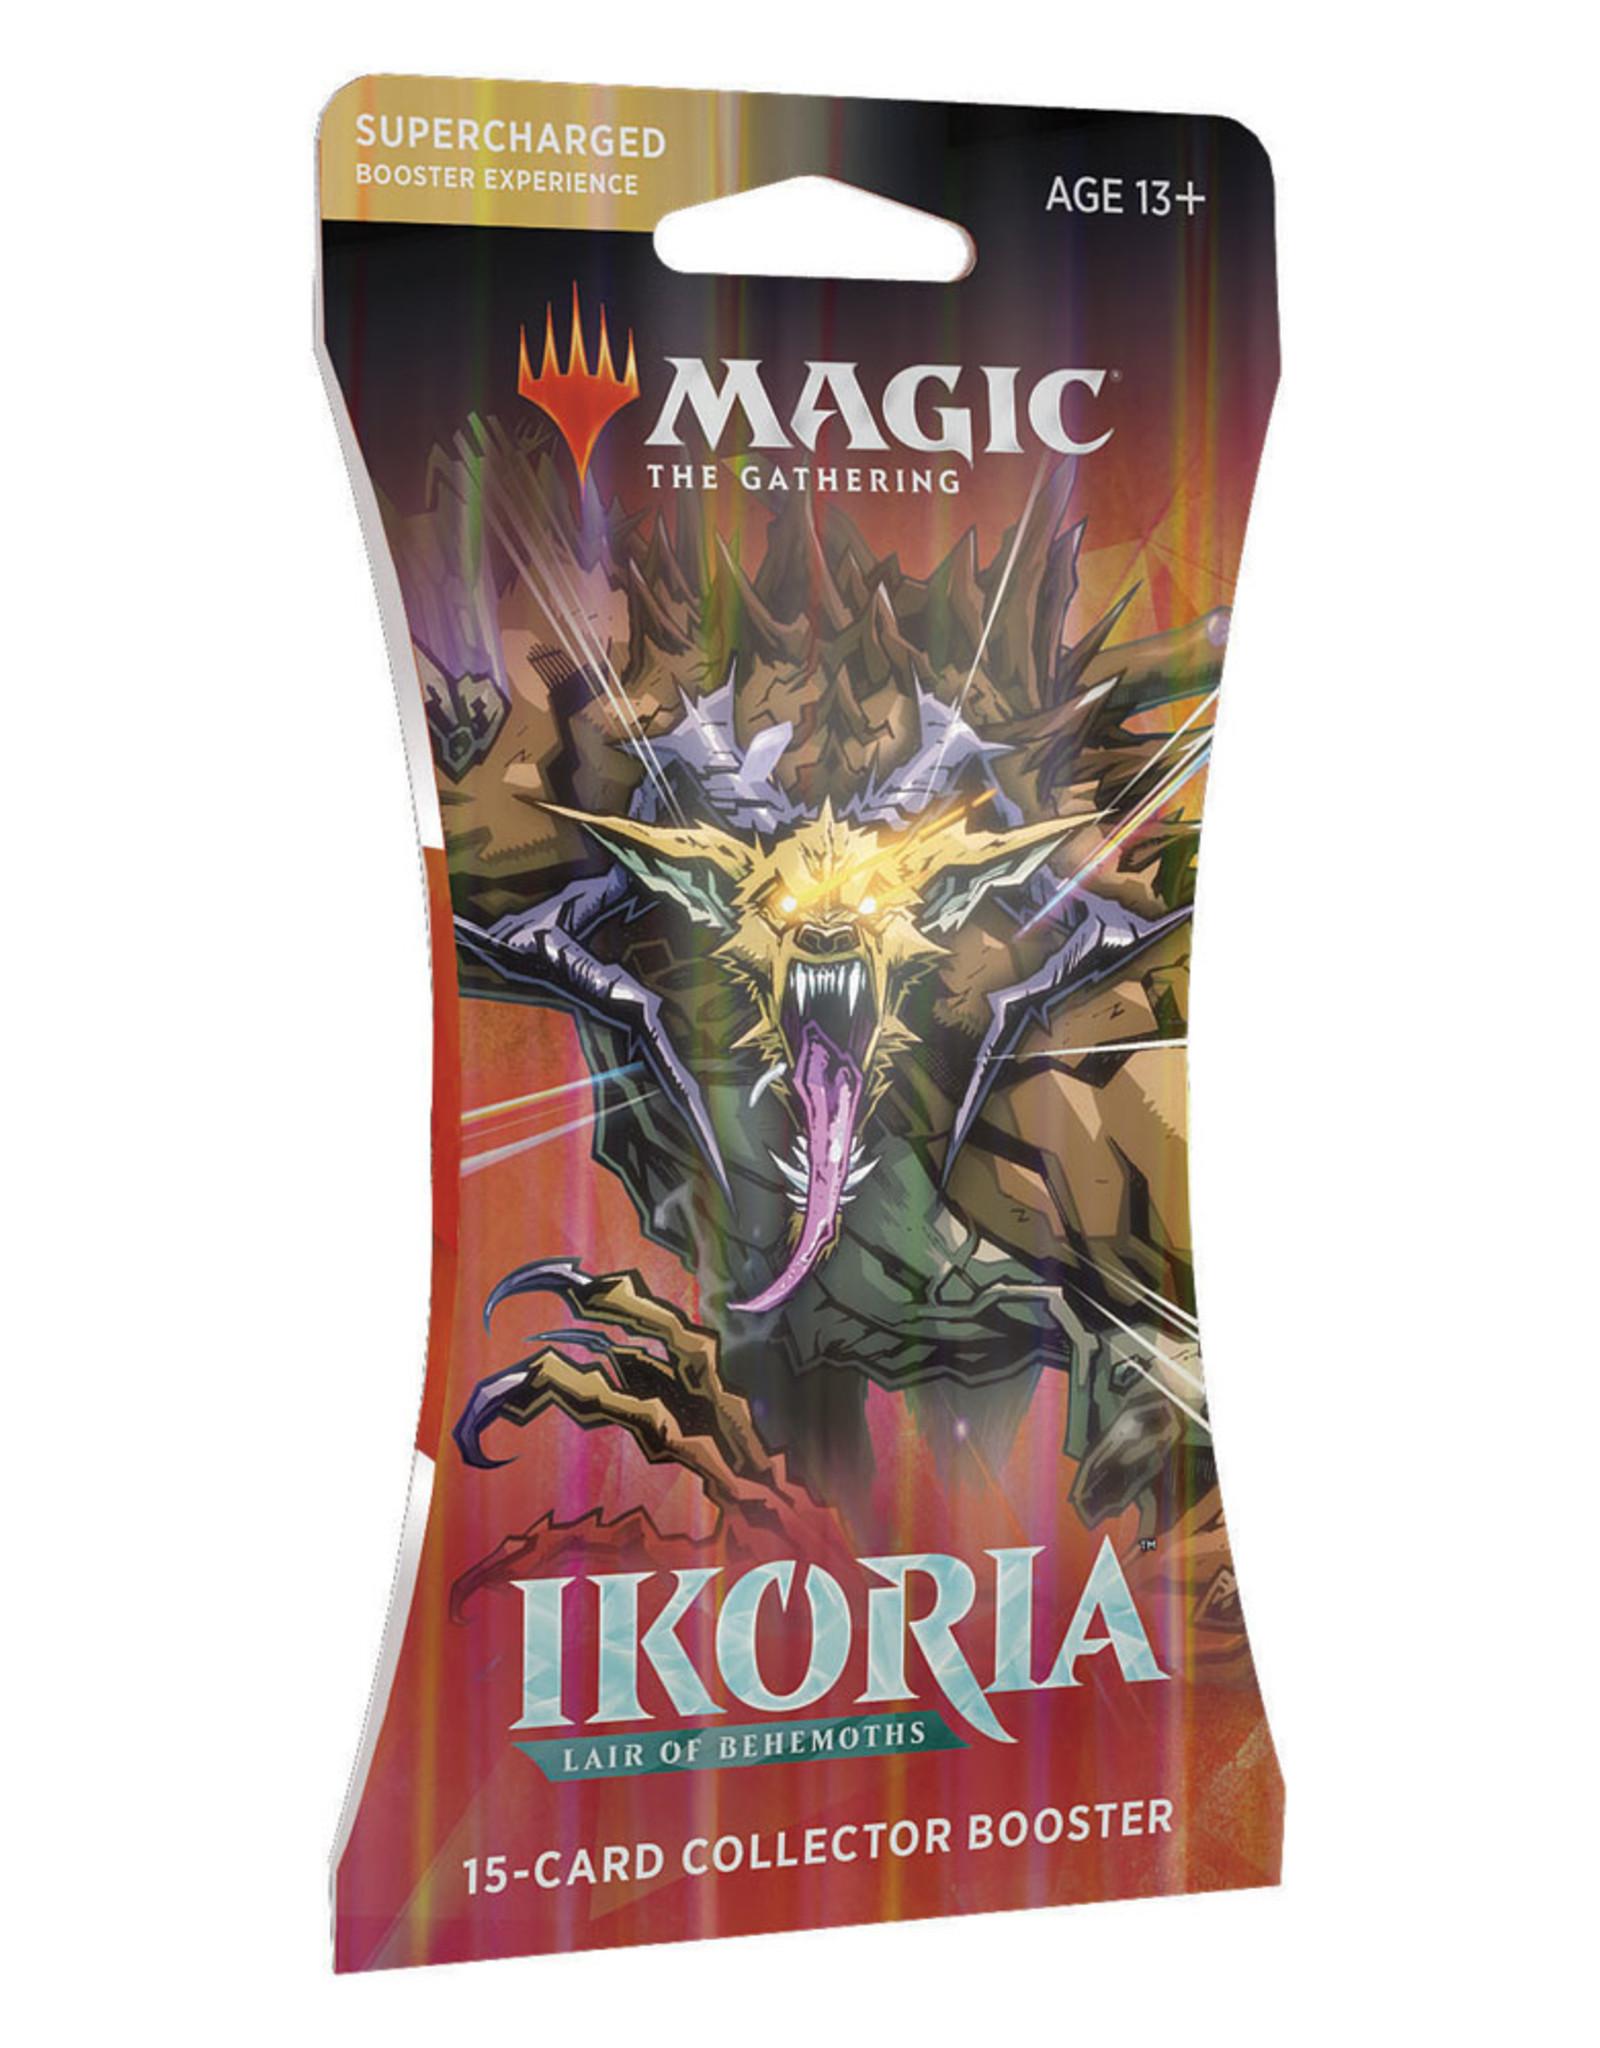 Magic MTG: Ikoria - Lair of Behemoths Collector Booster Pack